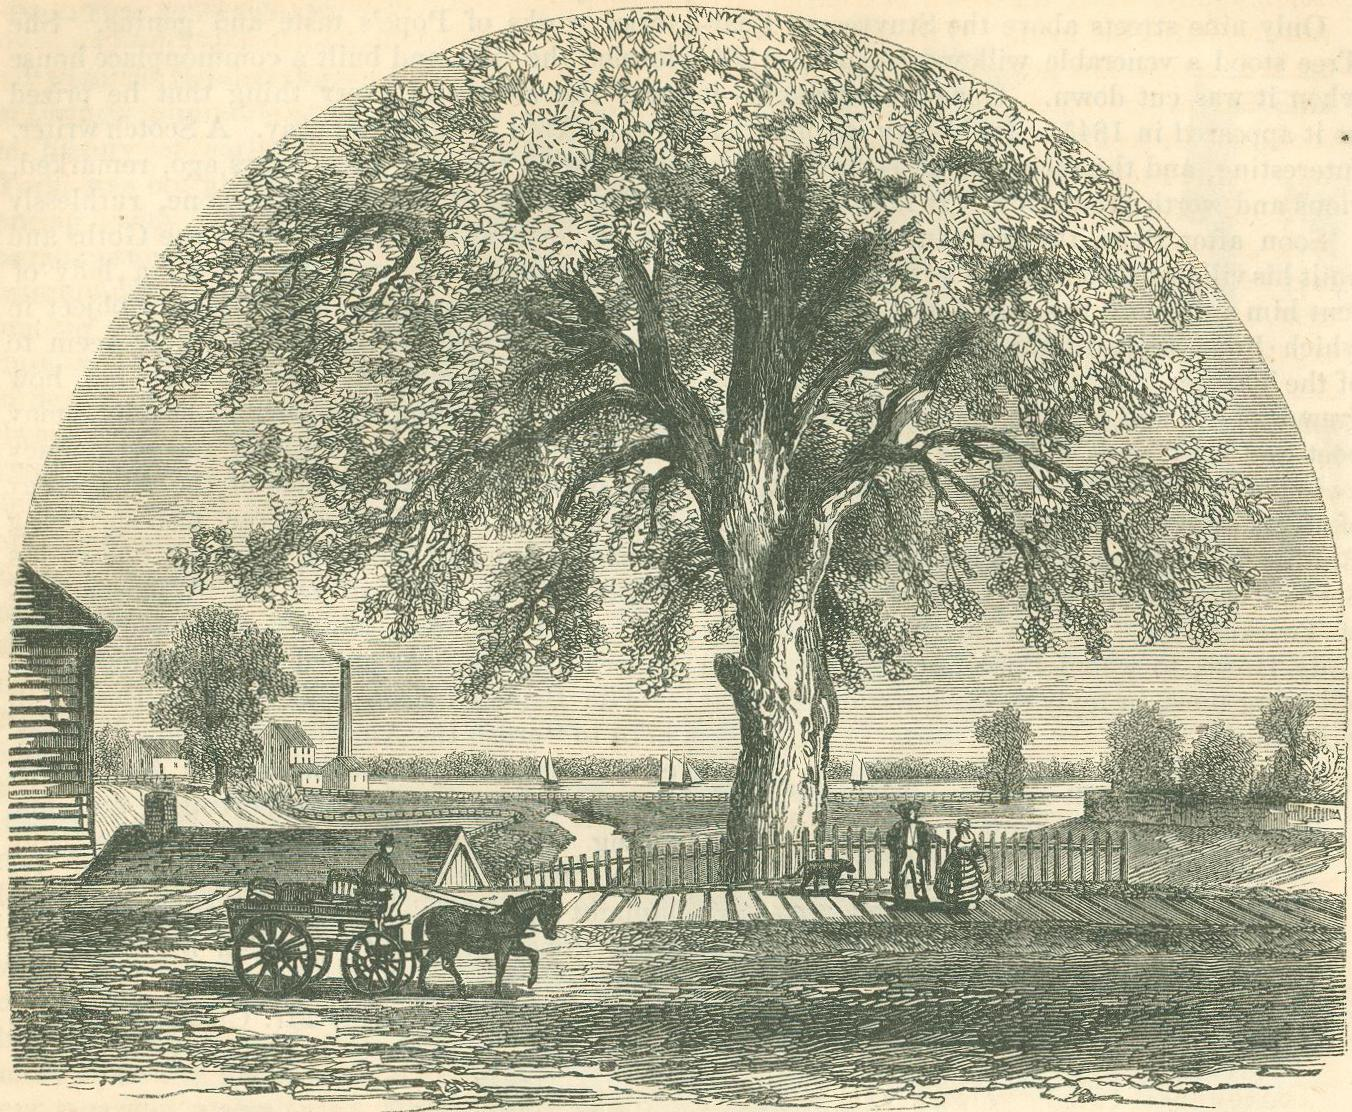 Digital history project american historical trees pontiacs memorial tree publicscrutiny Gallery